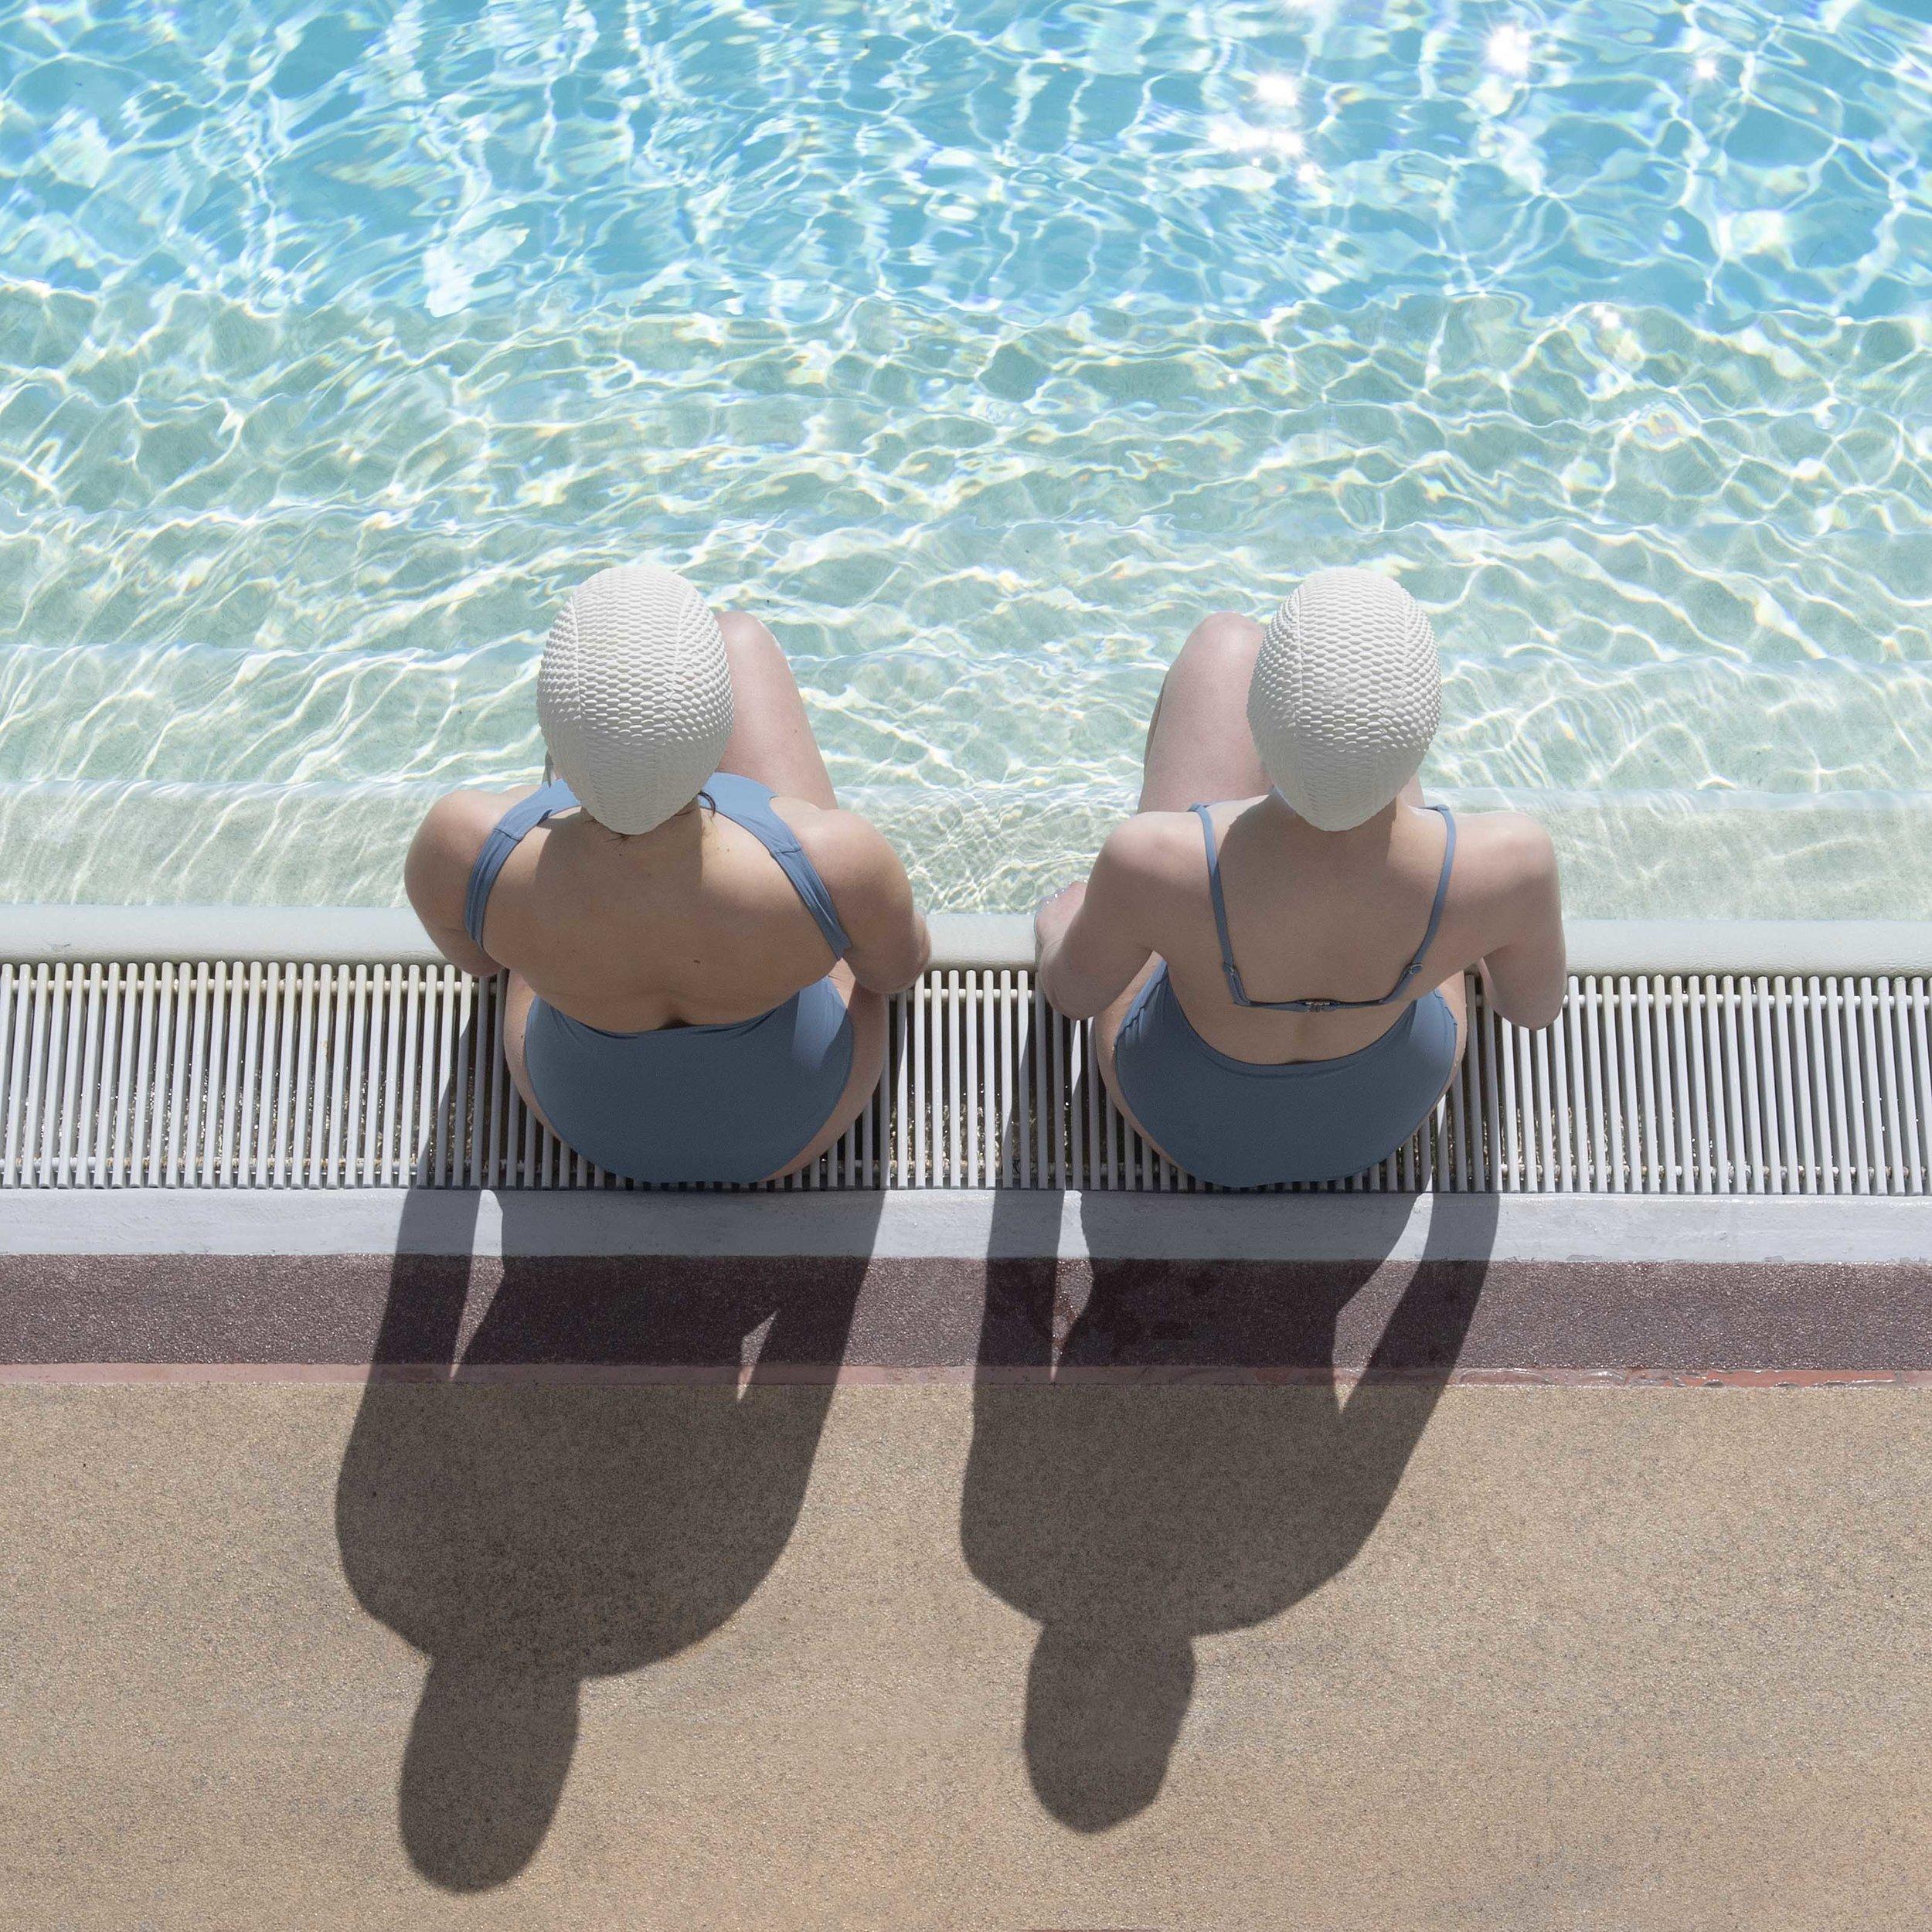 girls at the summer pool.jpg